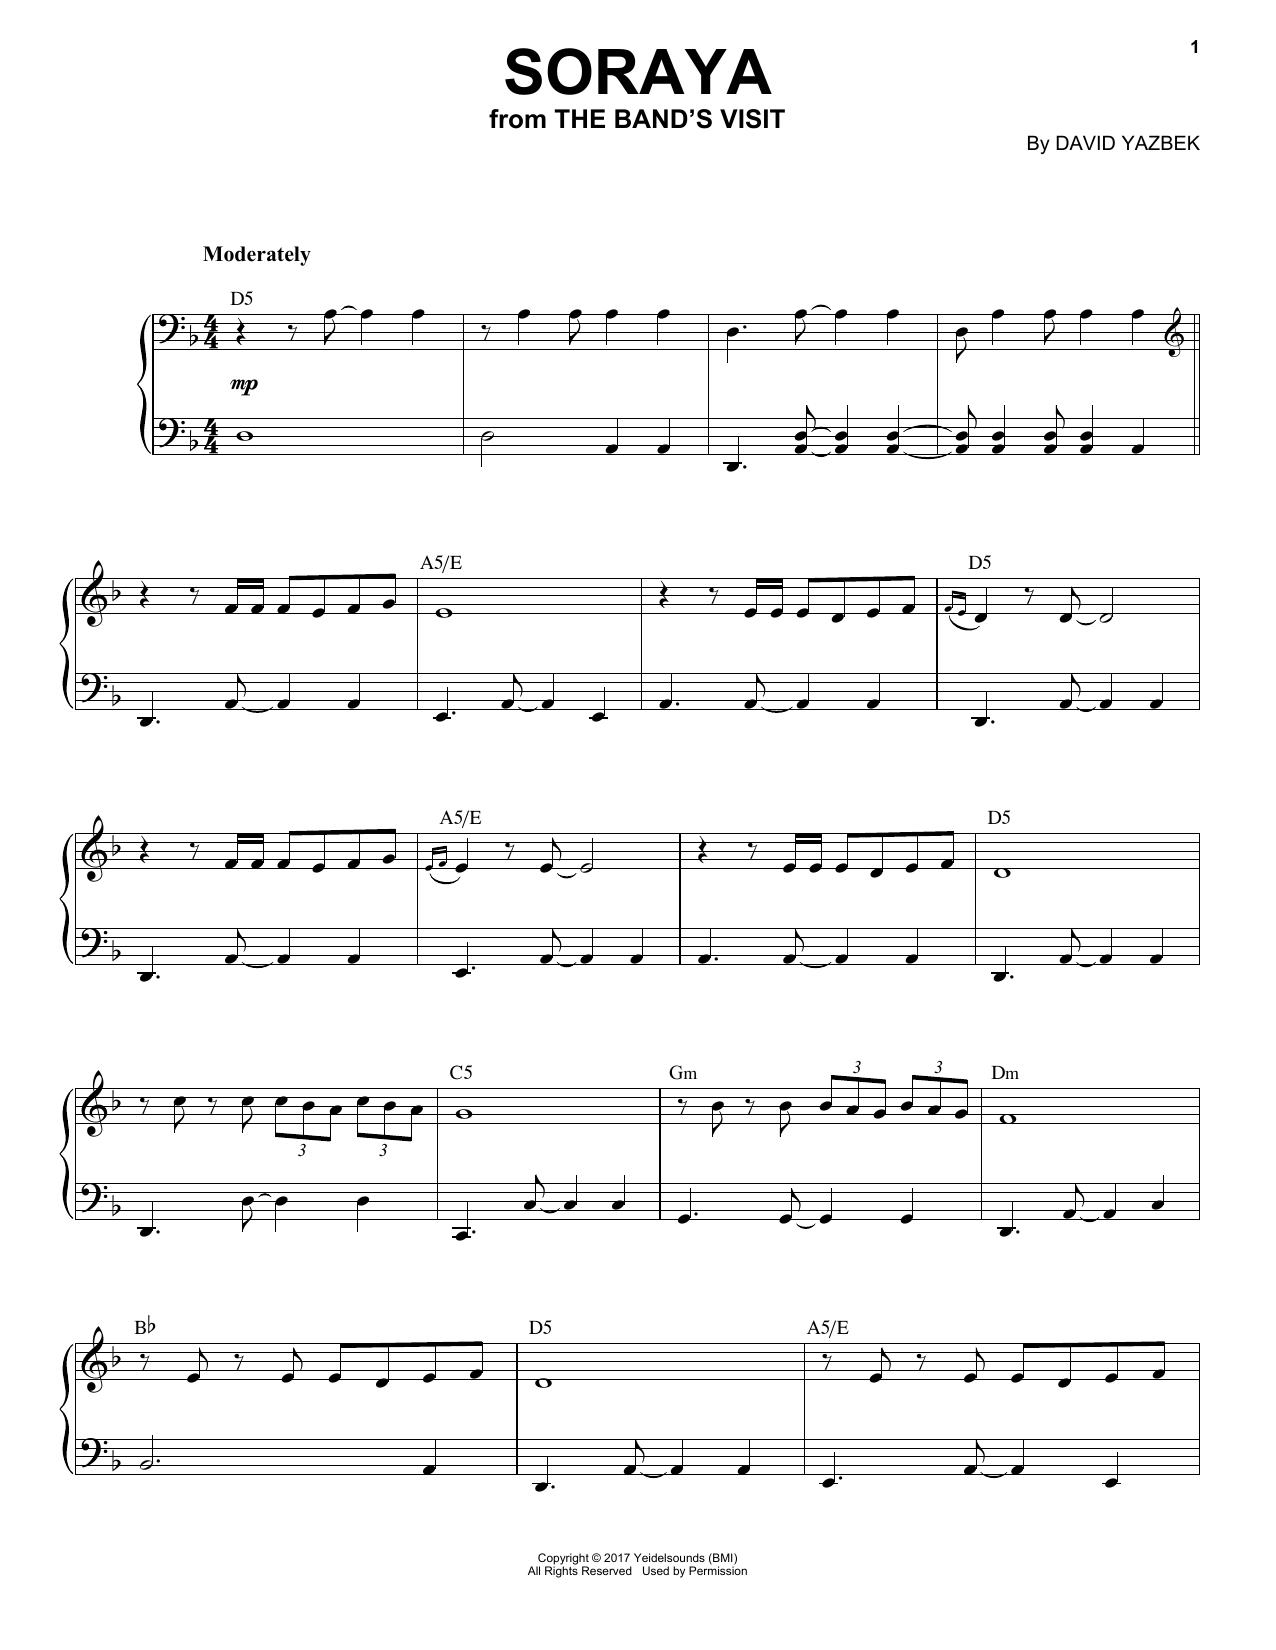 David Yazbek Soraya (from The Band's Visit) sheet music notes and chords. Download Printable PDF.